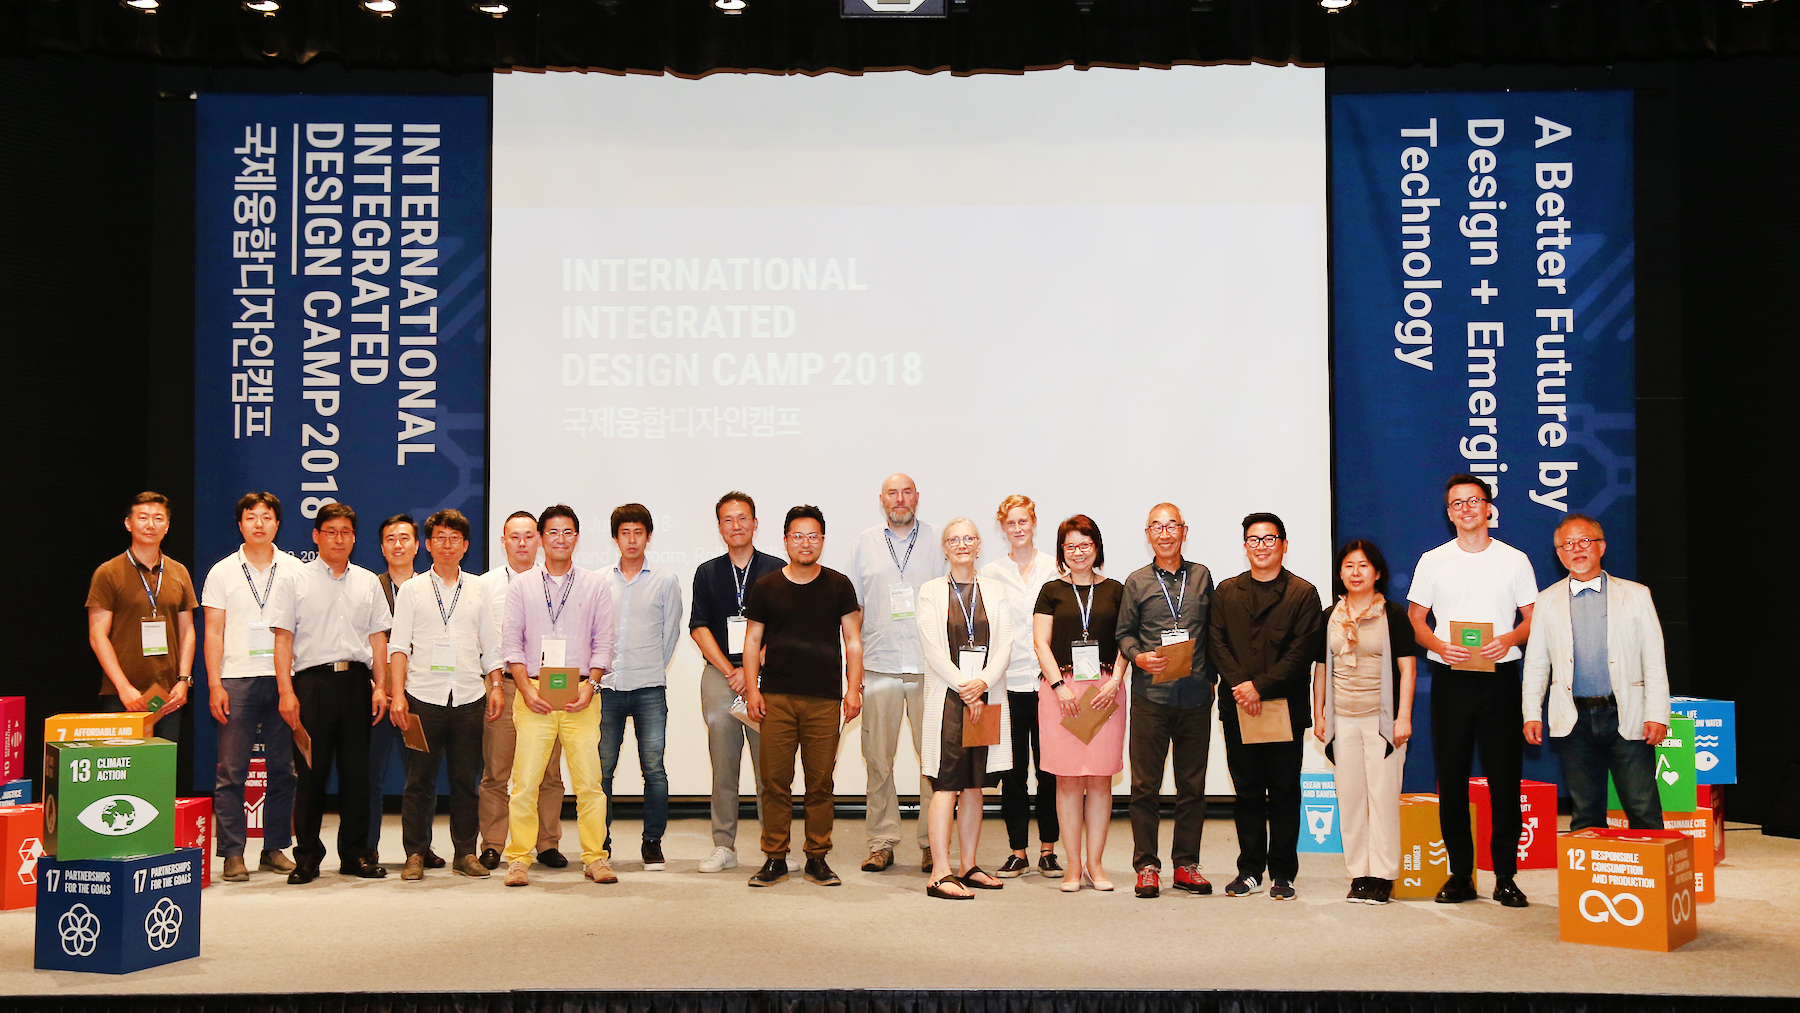 KIDP-IIDC 2018 Day 3 - 180 tutors on stage b.jpg